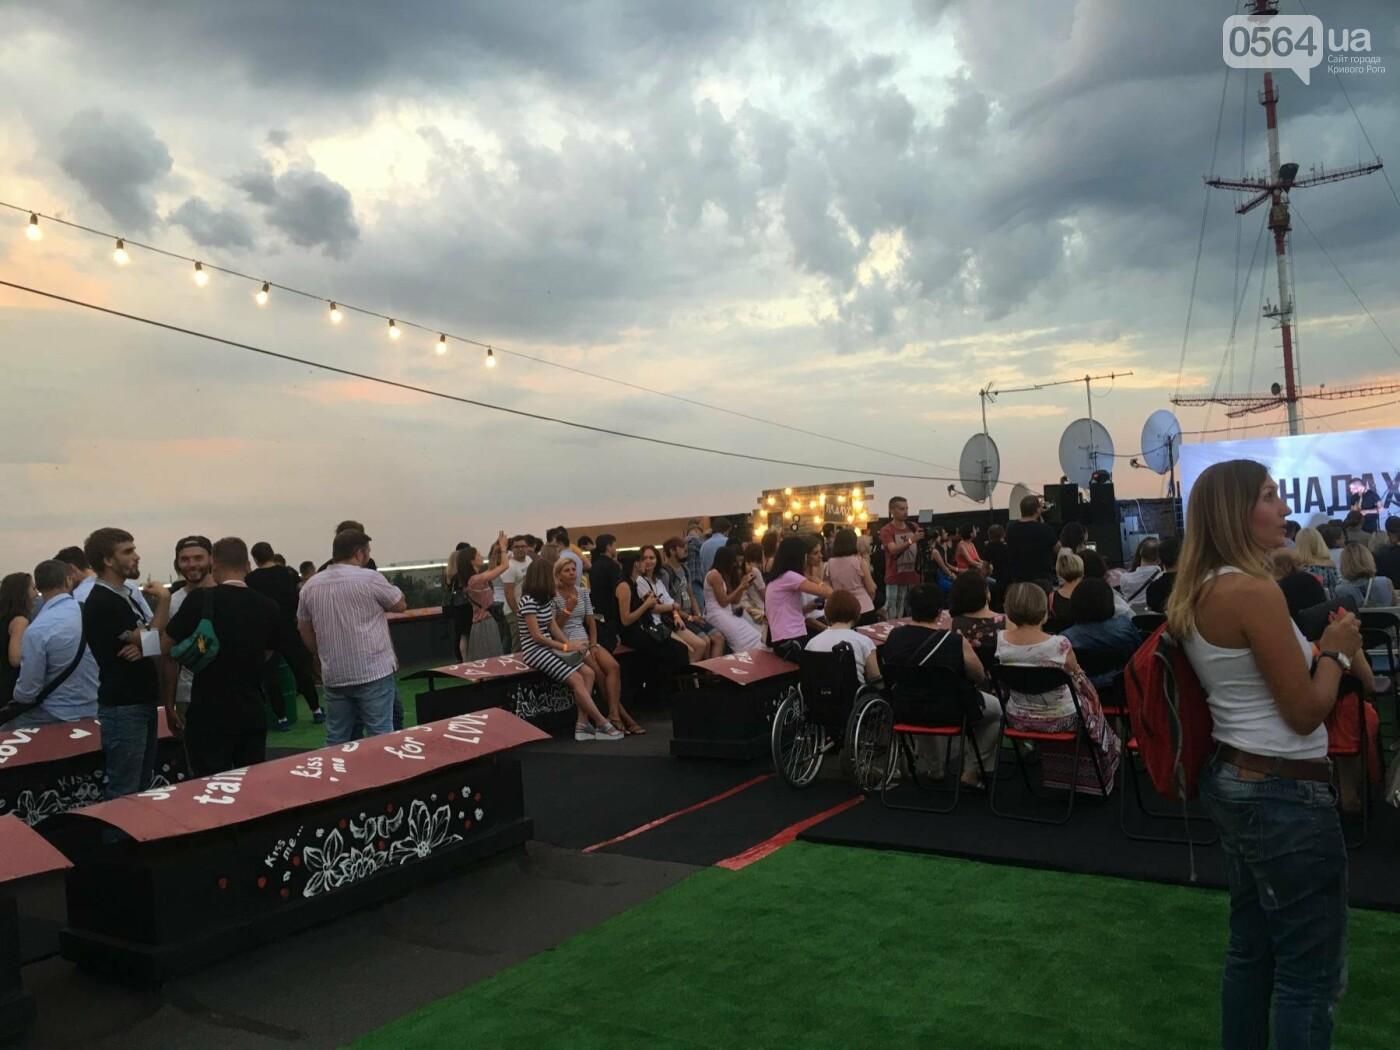 Сотни криворожан встречали закат на крыше отеля под мелодии джаза, - ФОТО, ВИДЕО, фото-39